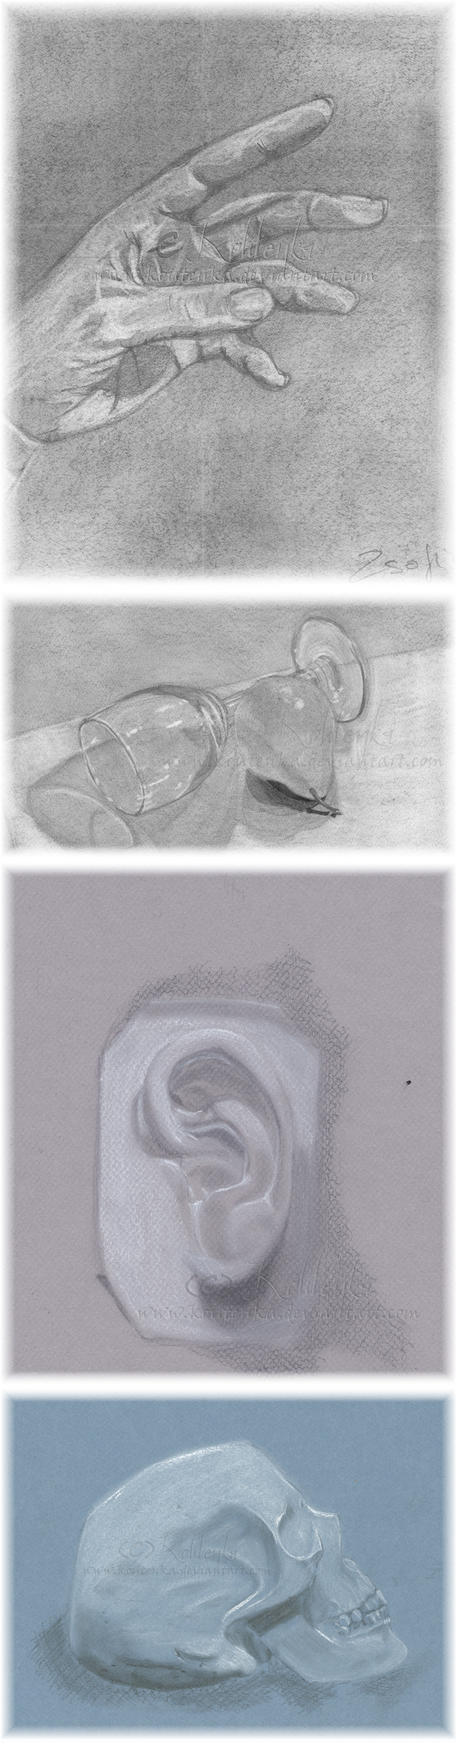 Shards of the brain by Koutenka